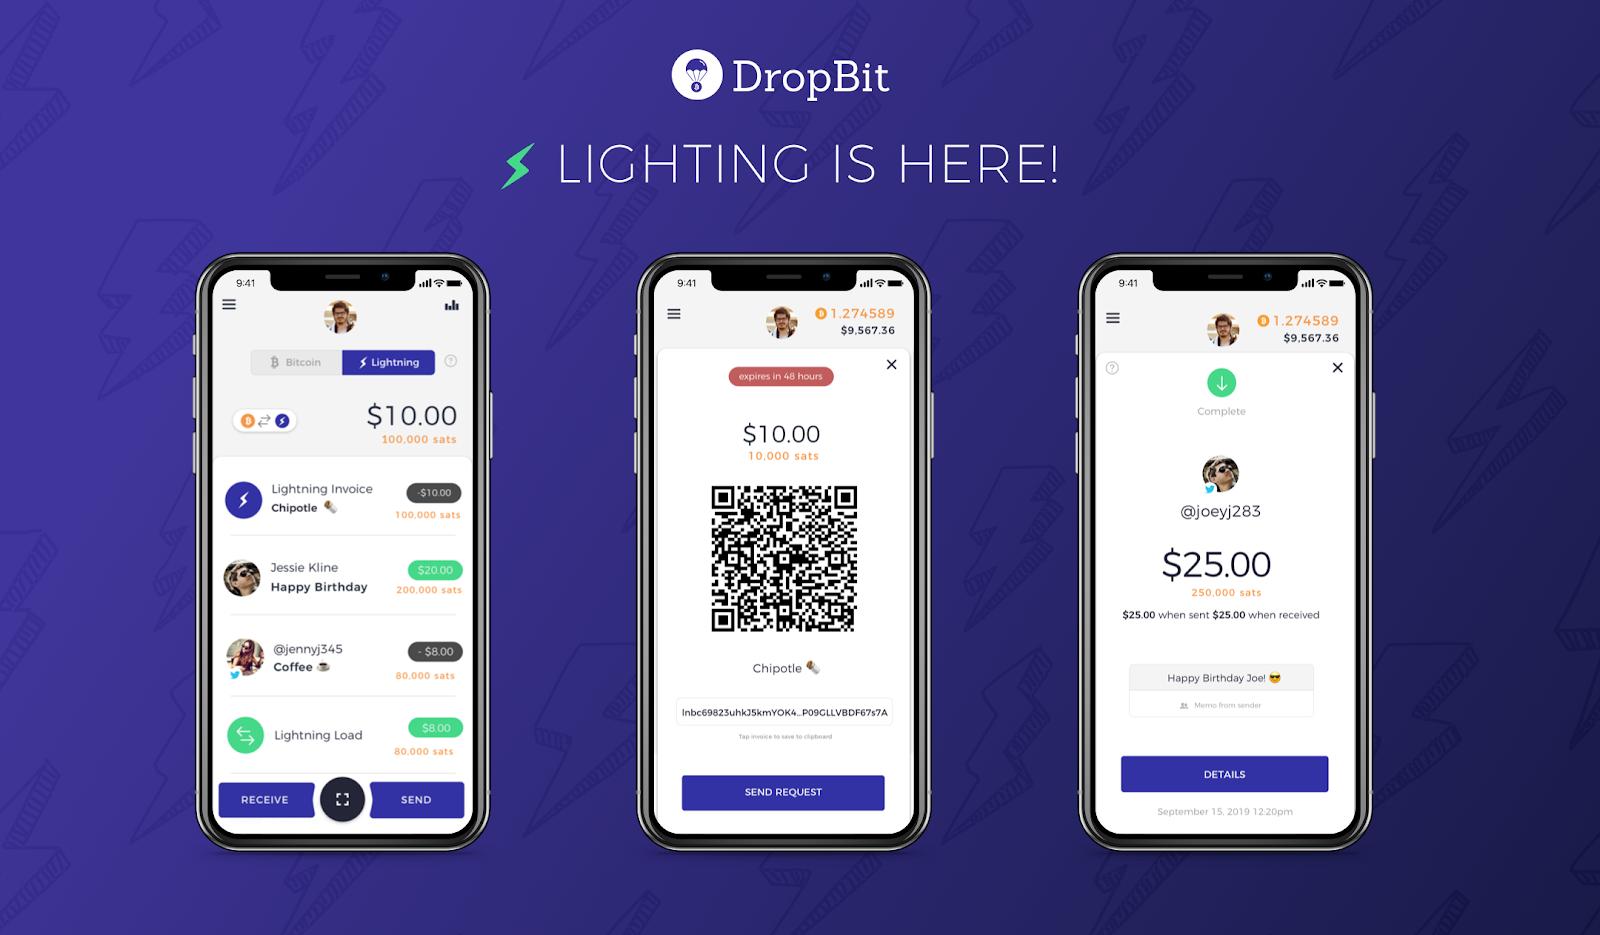 DropBit Adds Lightning Network Support